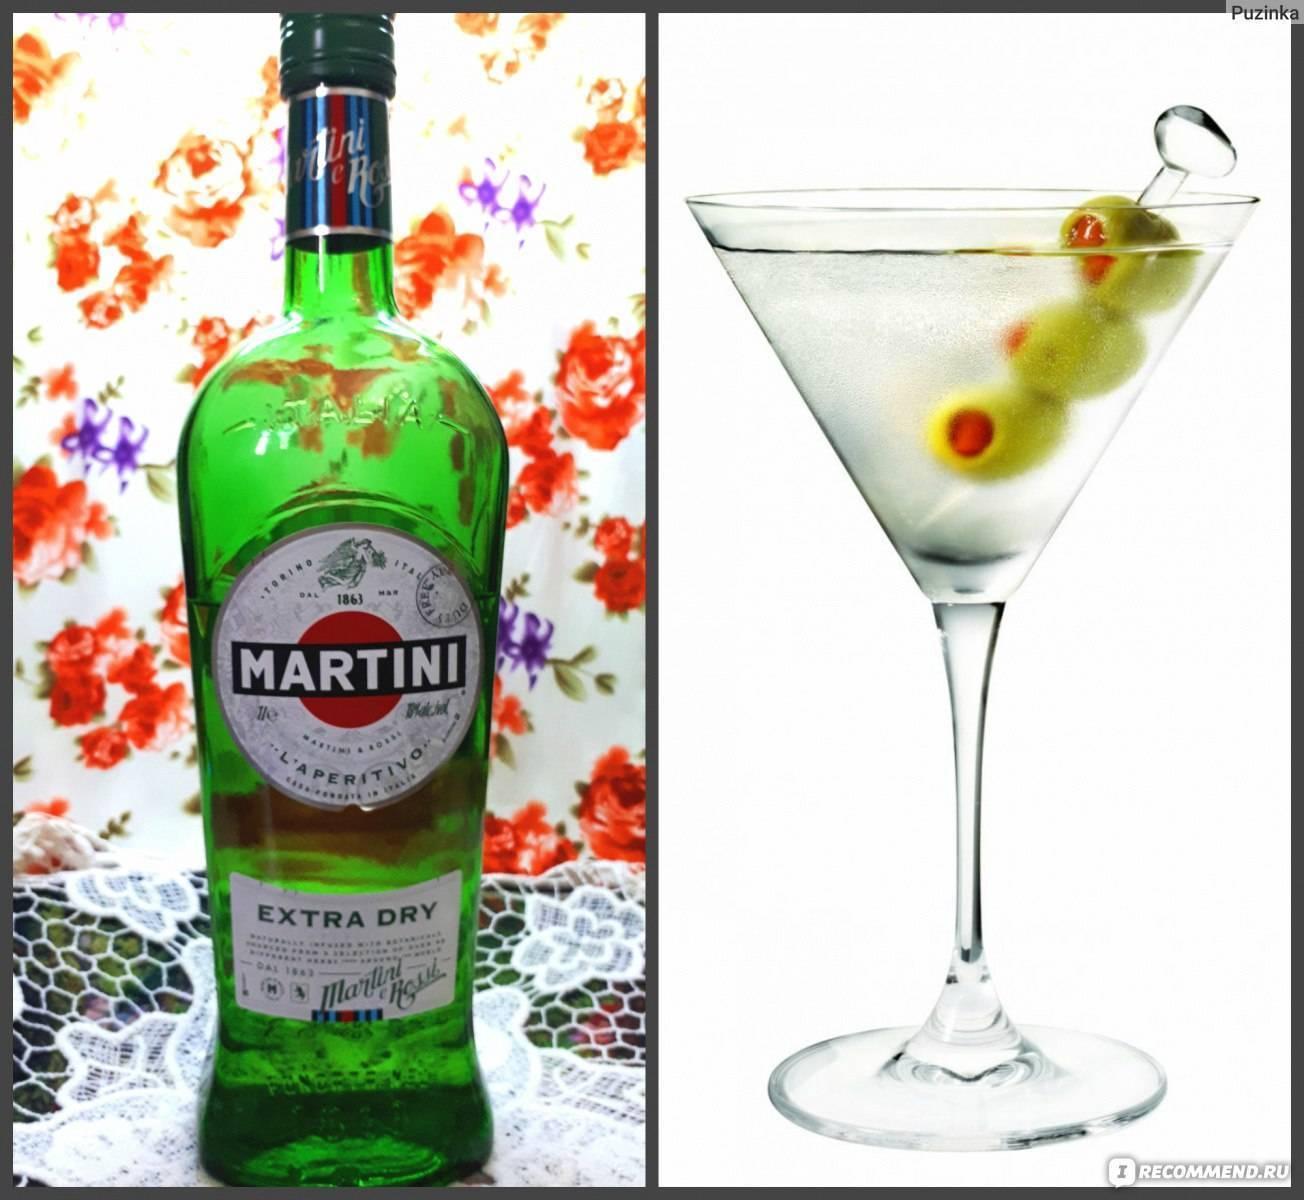 Мартини экстра драй вермут и другие виды напитка